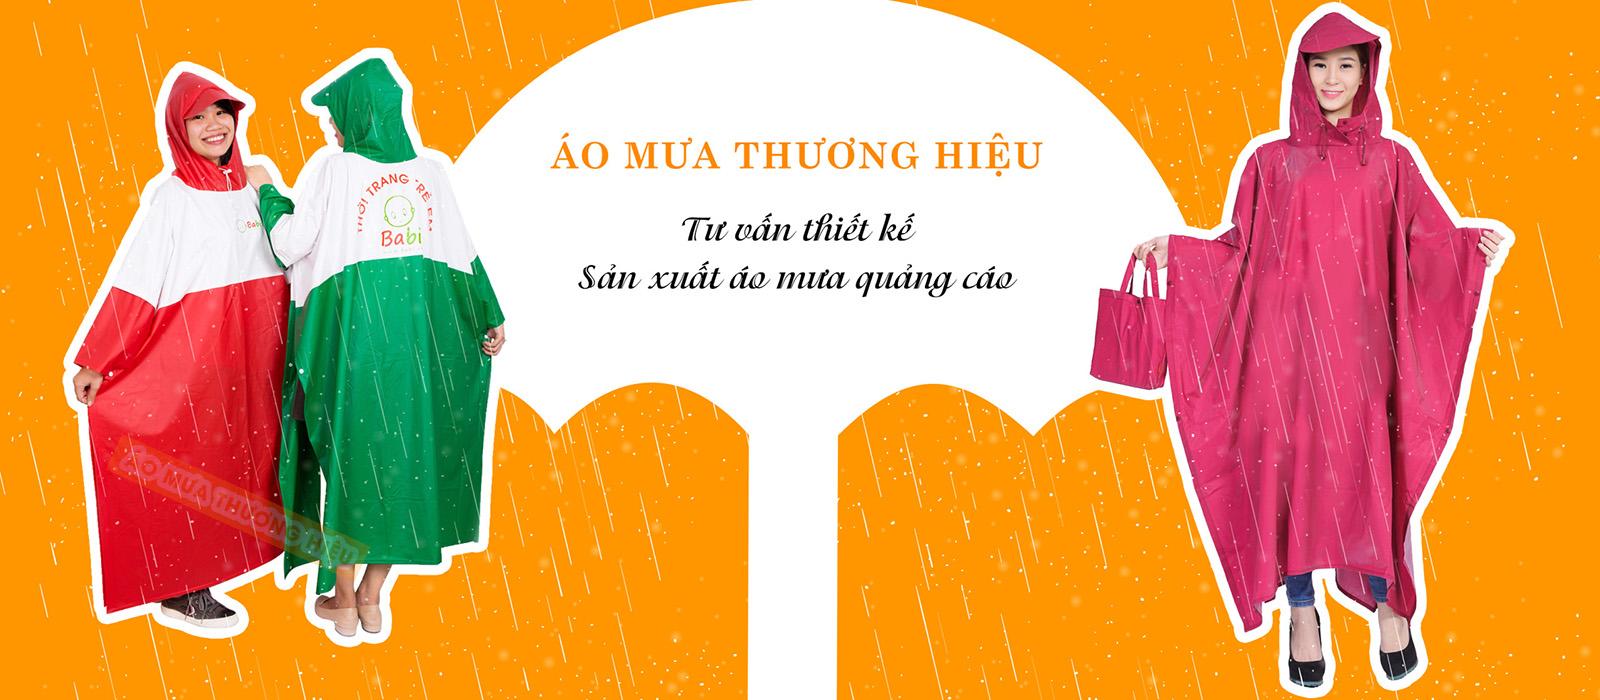 Banner ao mua thuong hieu 03